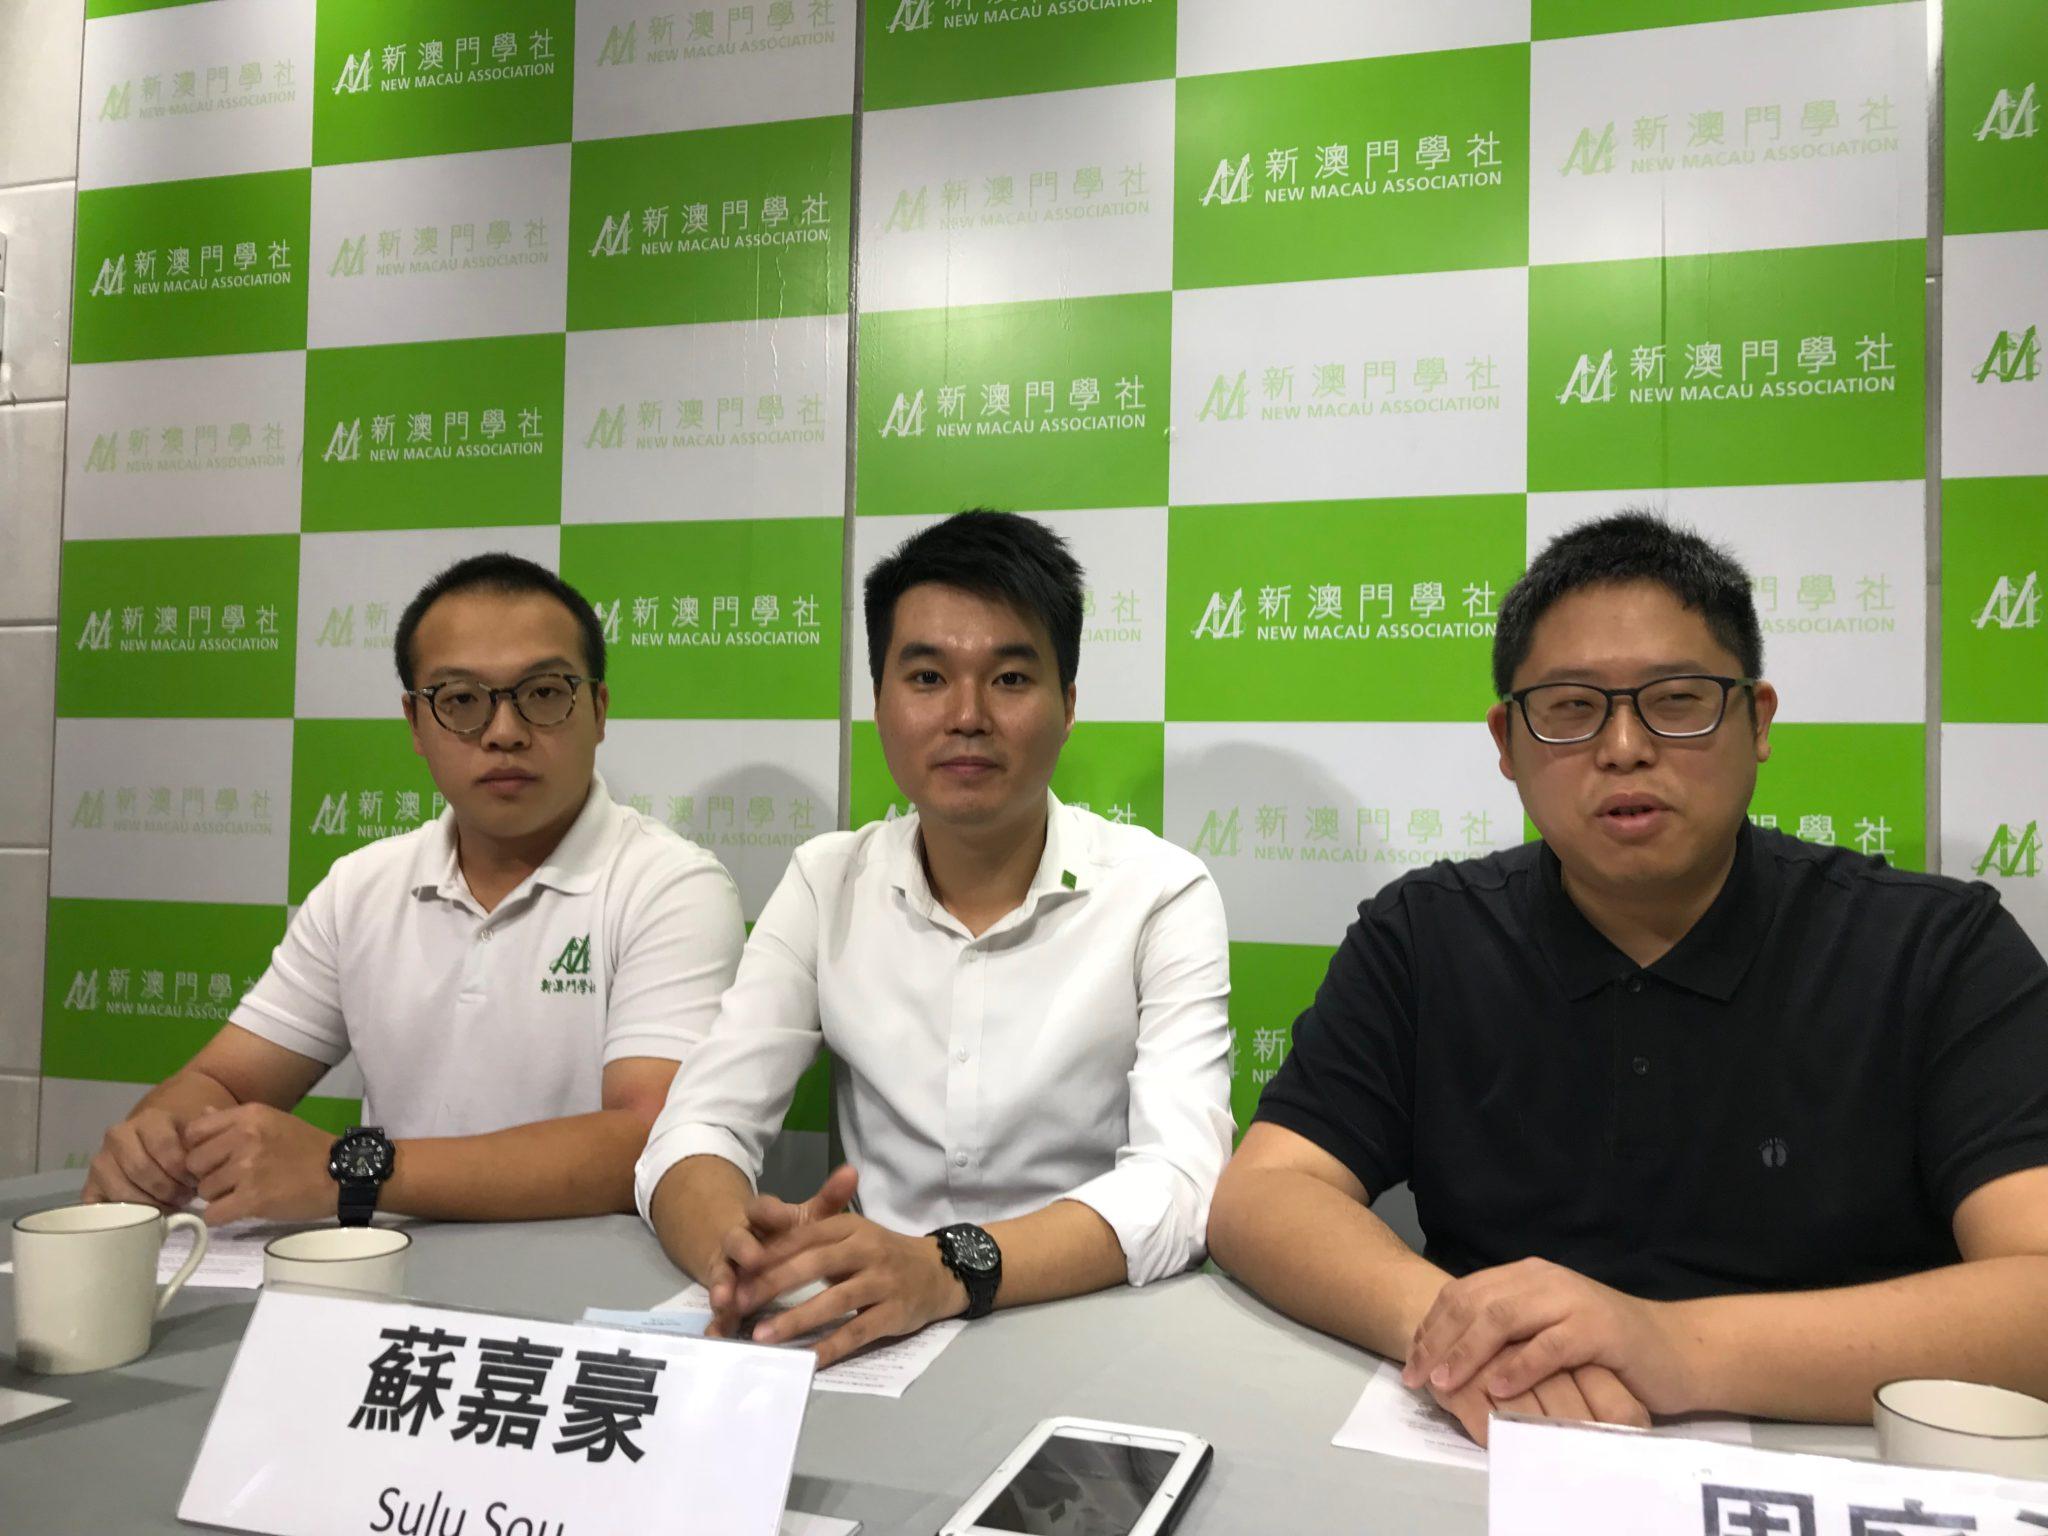 ONU eliminou opiniões de ONG de Hong Kong. Macau escapou